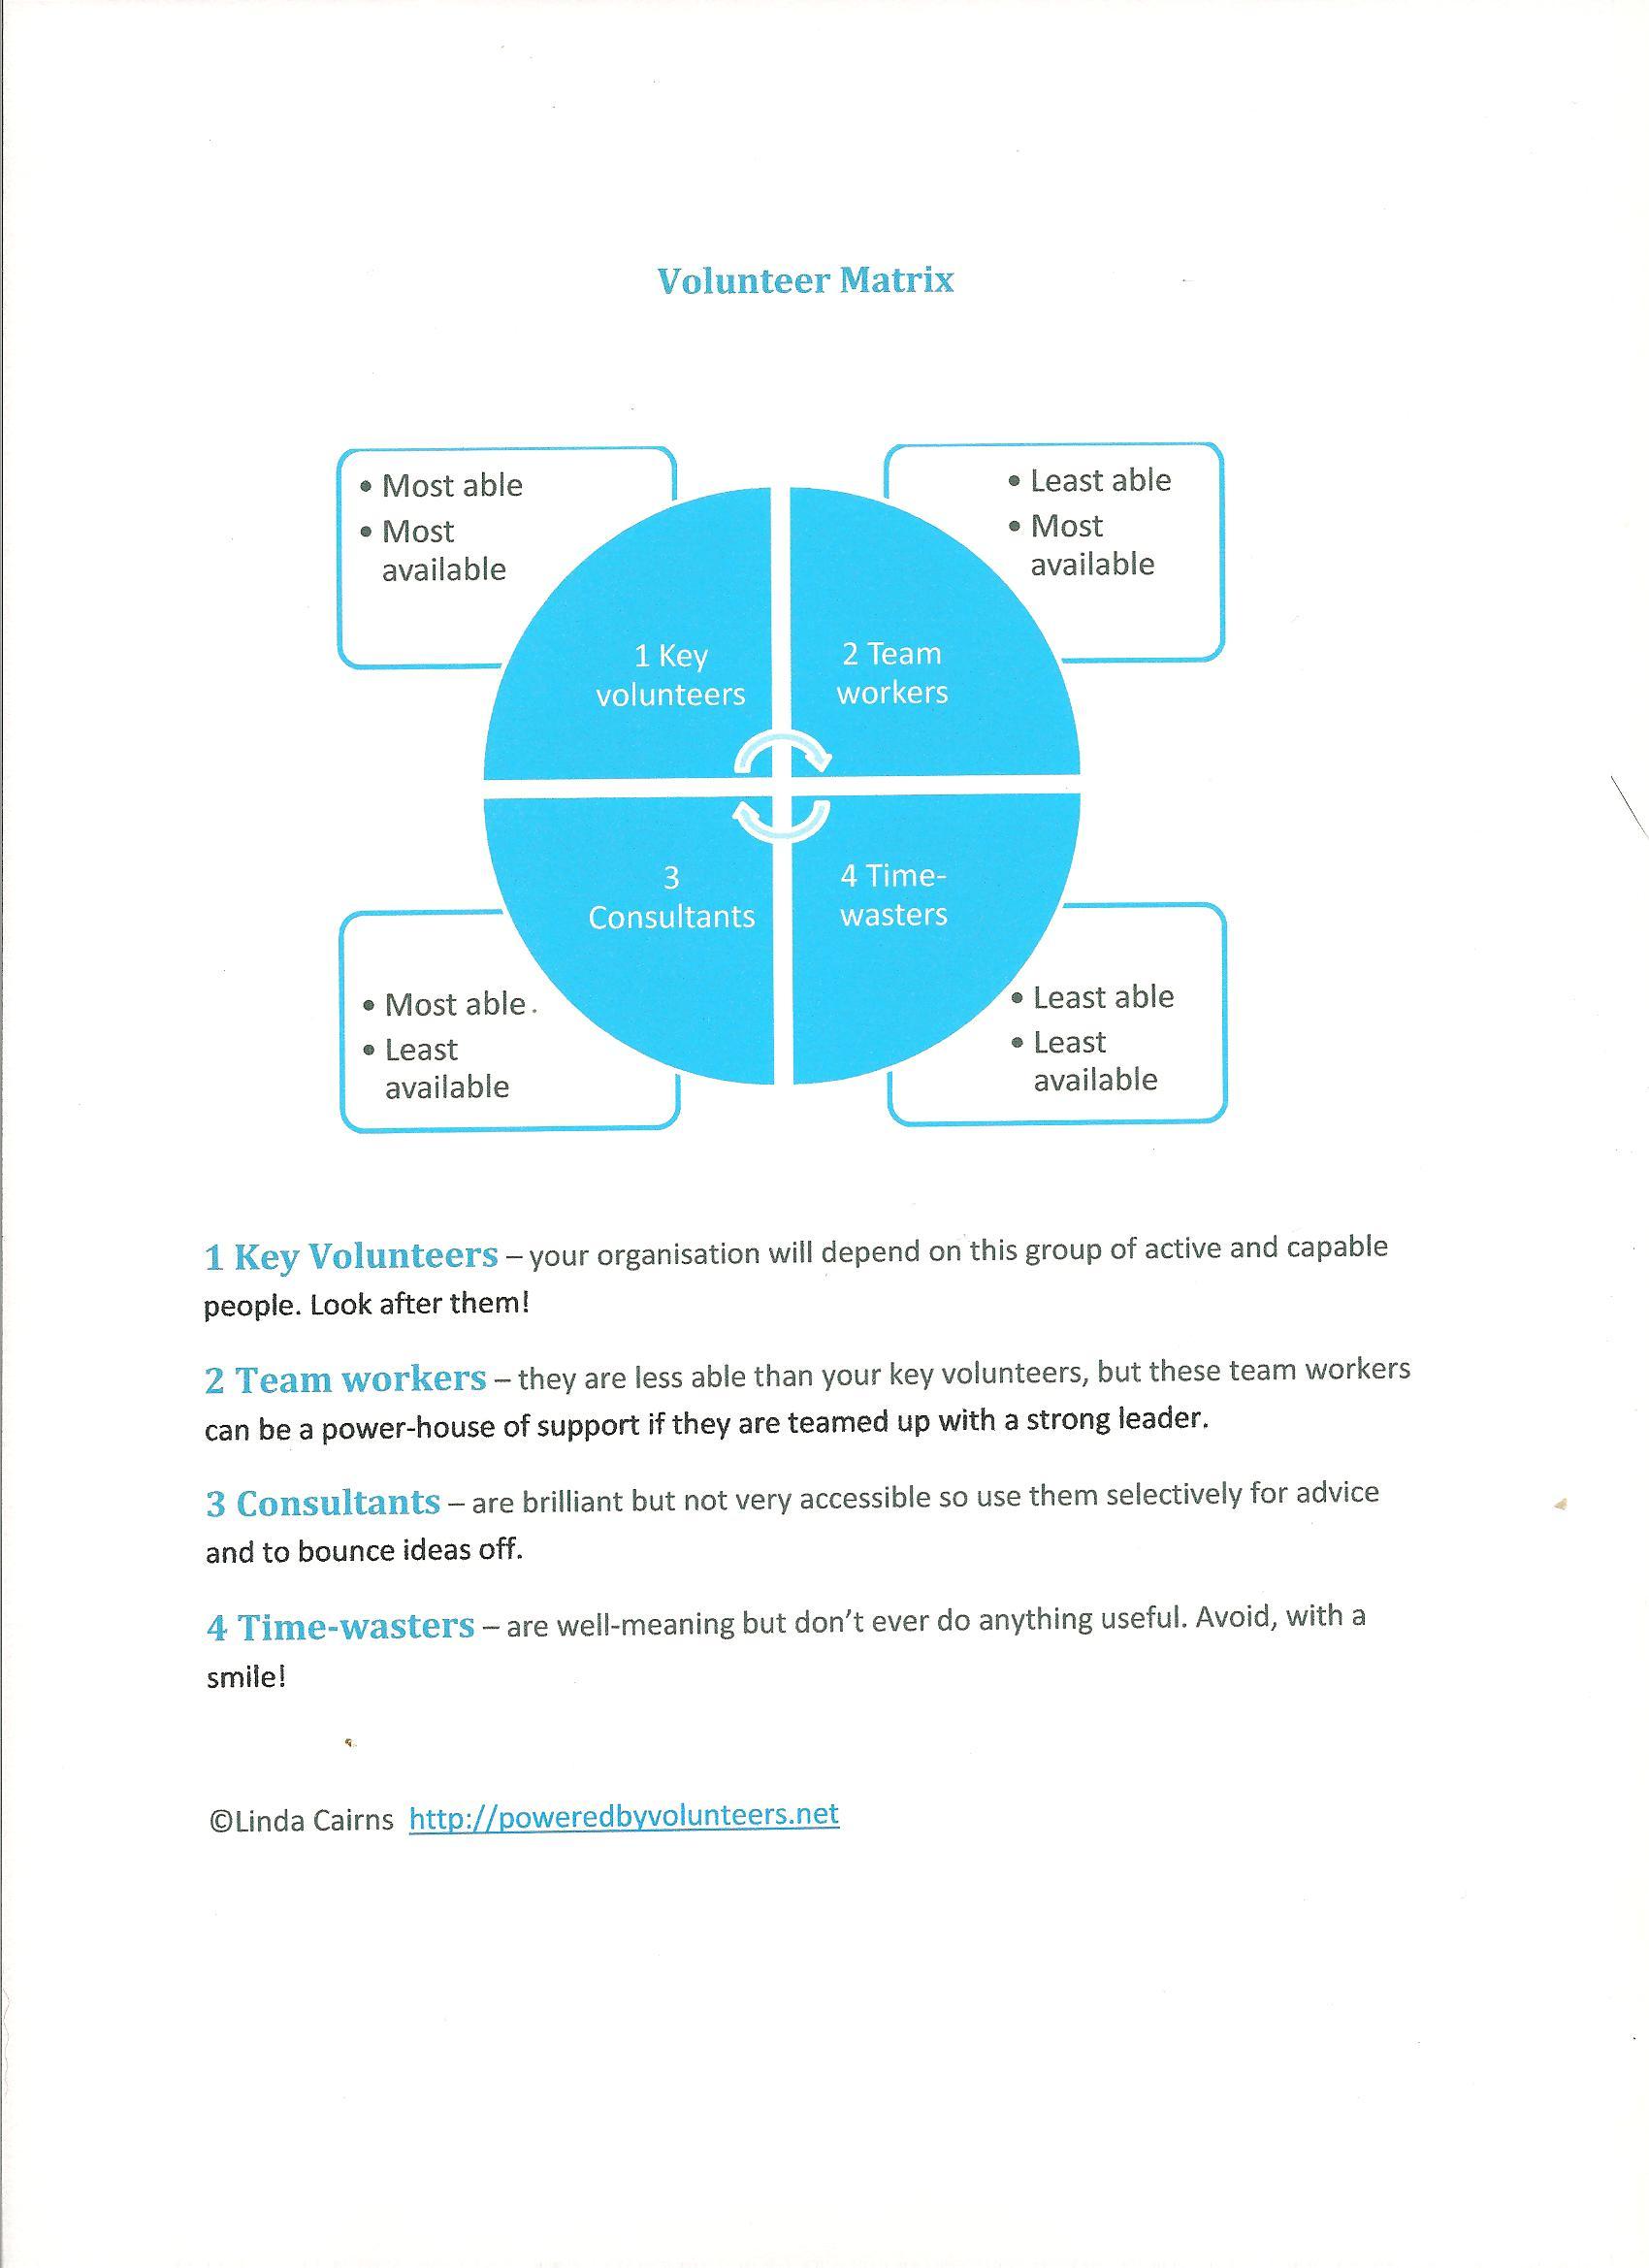 Diagram showing different types of volunteers